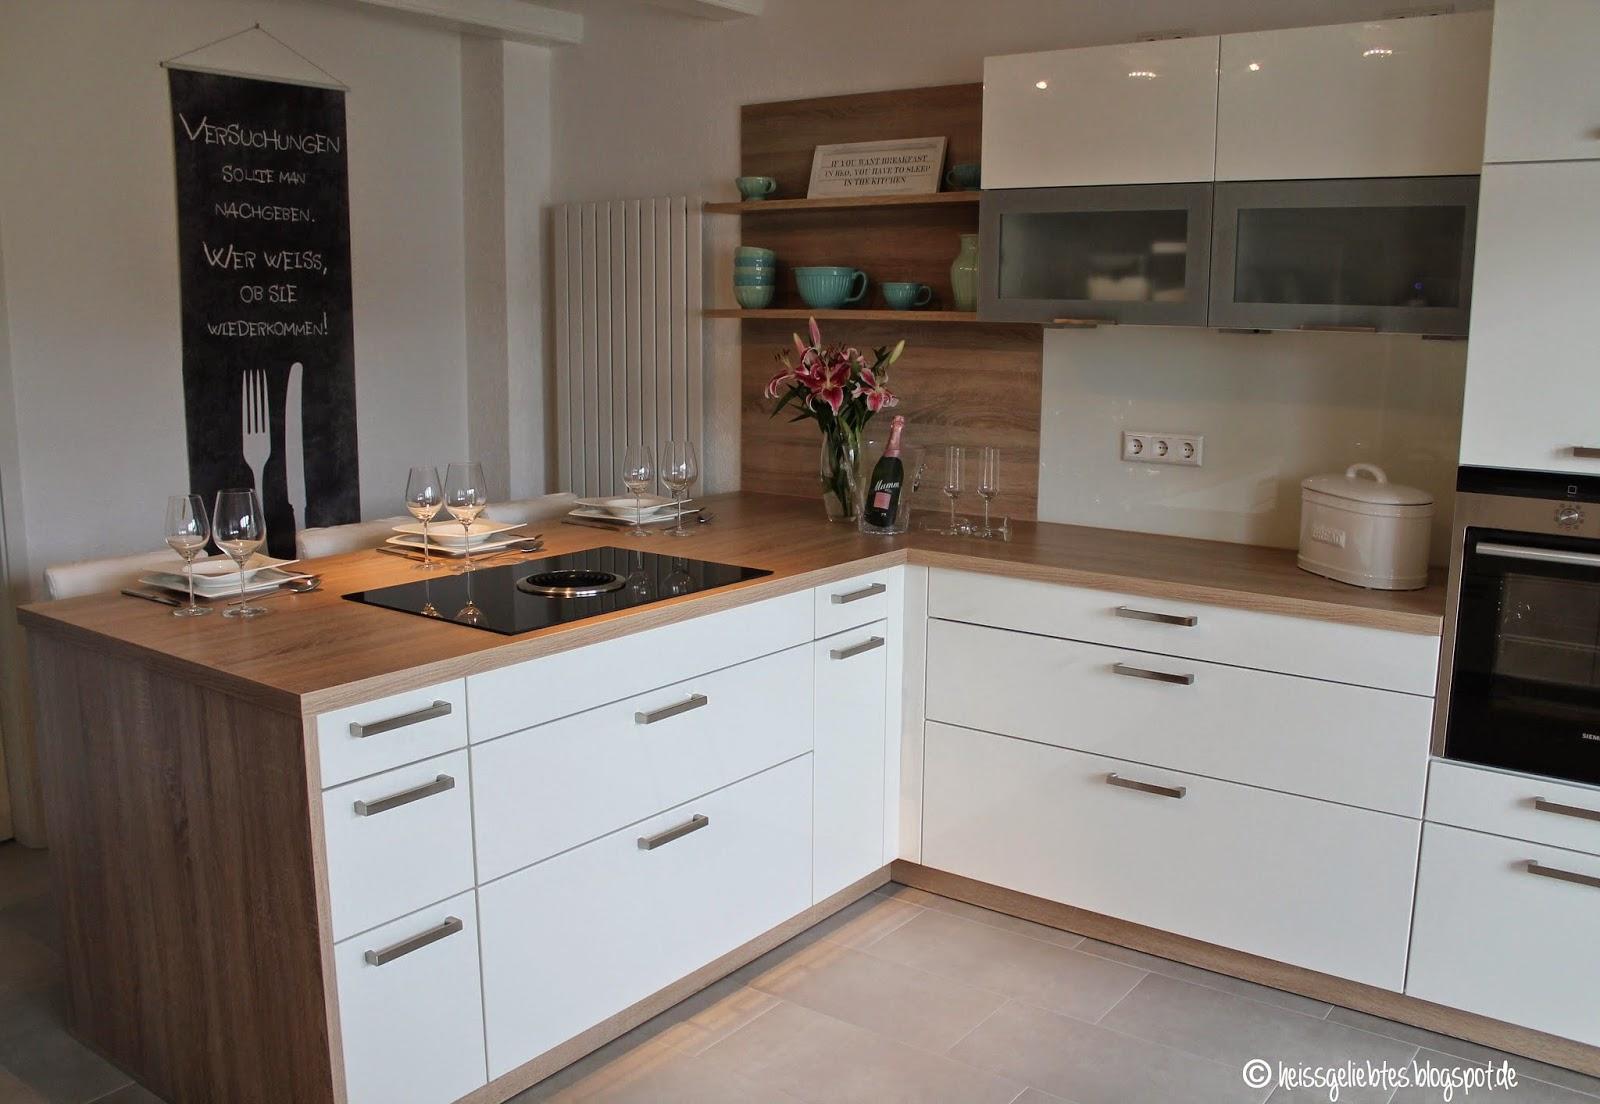 Küche dunstabzug nach unten bosch küchengeräte bilder and infos